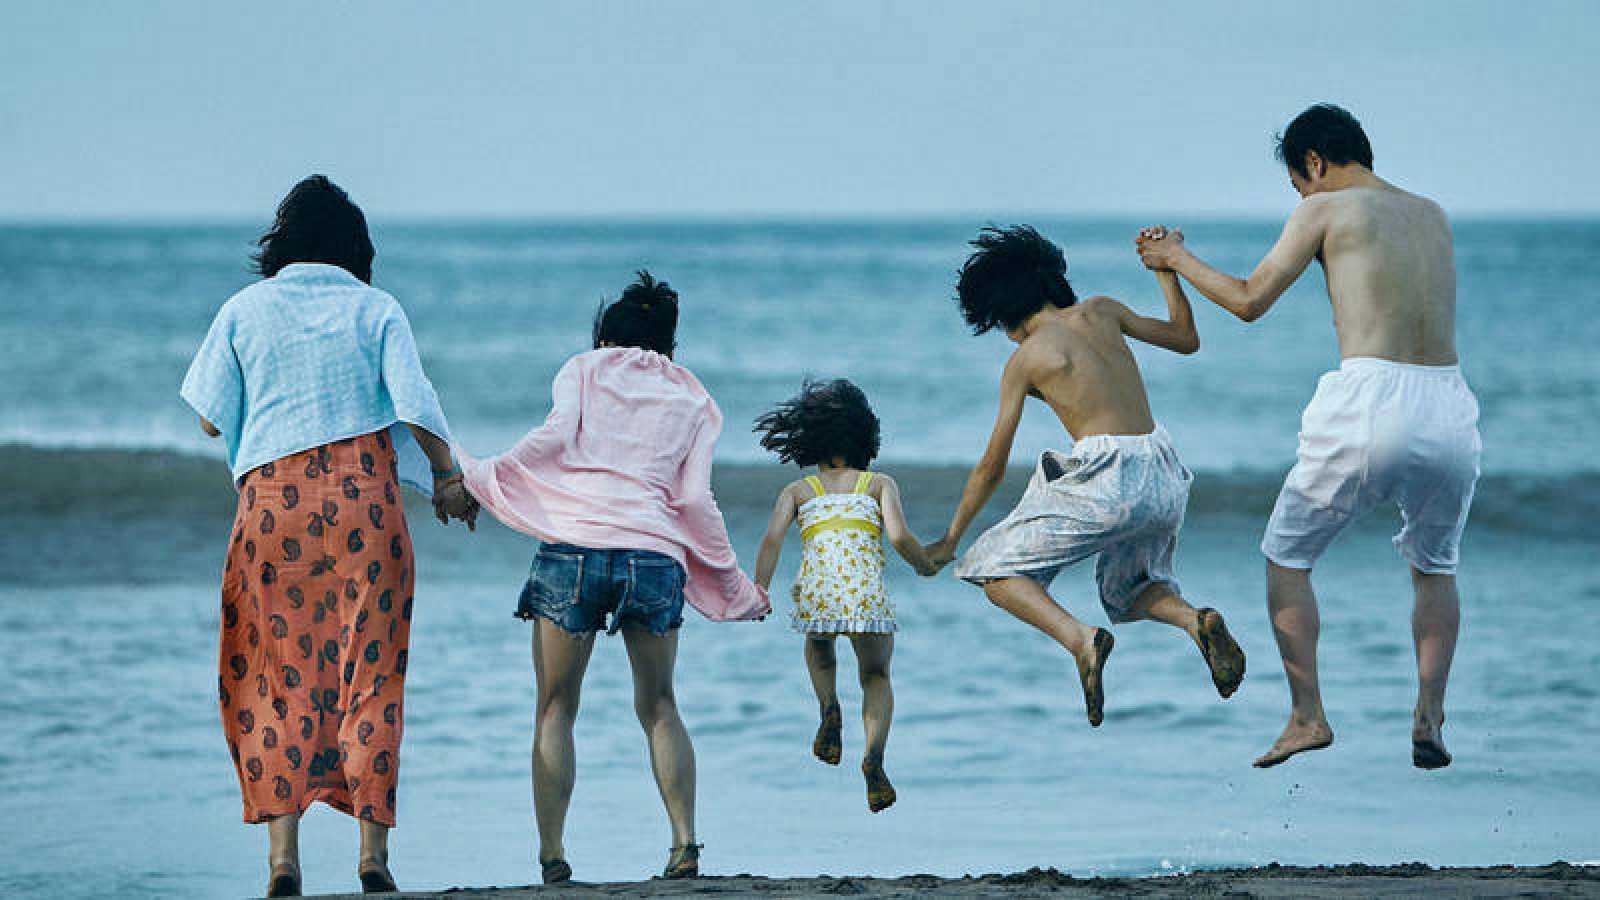 'Un asunto de familia', de Hirokazu Kore-eda.